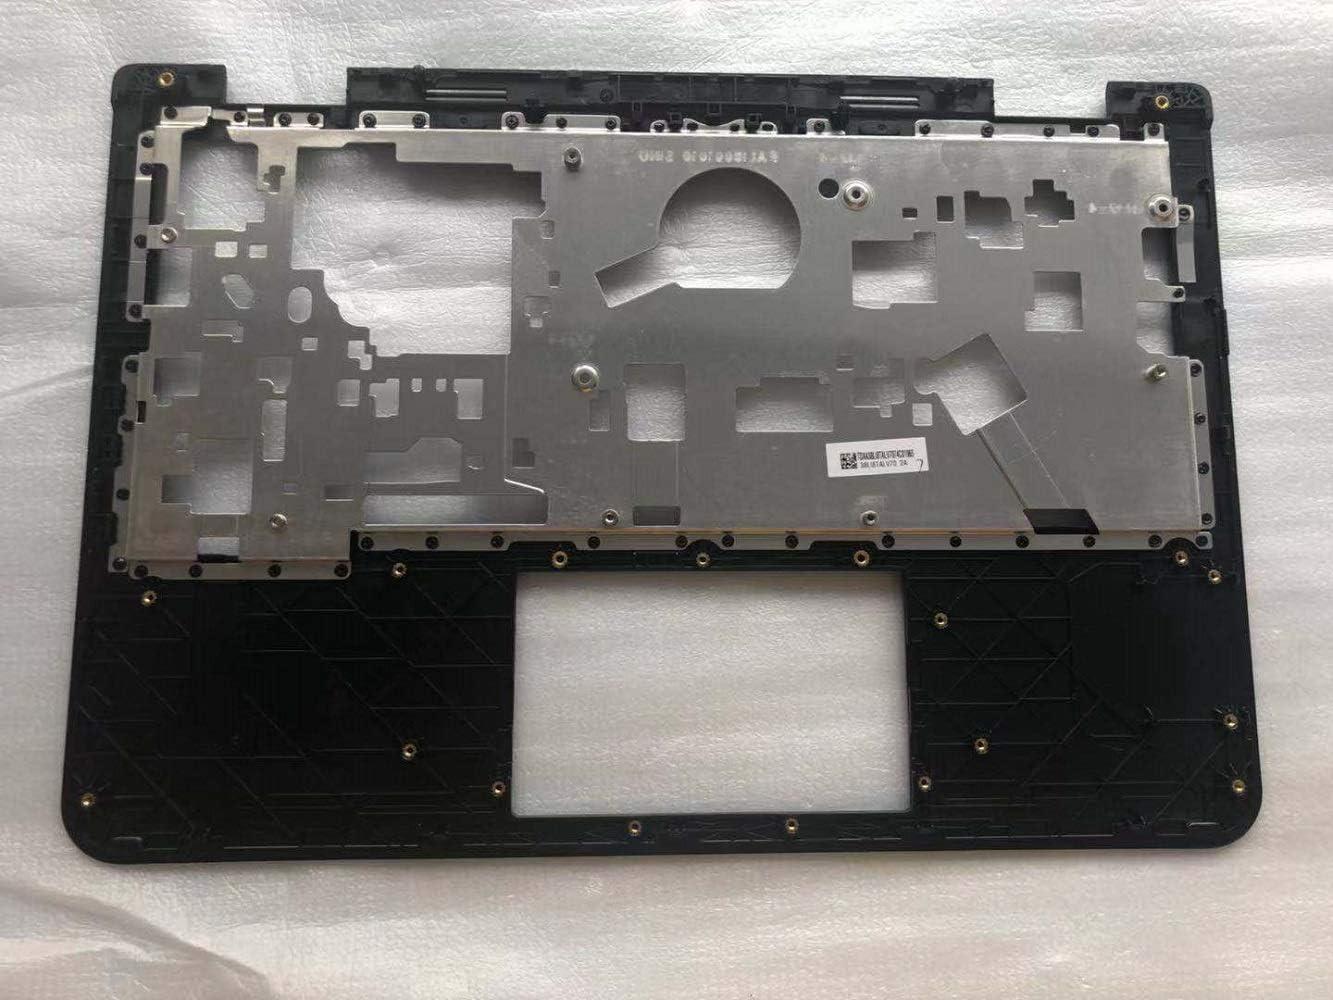 New Replacement Palm Rest Cover fit Lenovo Thinkpad Yoga 11e 20G8 3rd Gen 01AV969